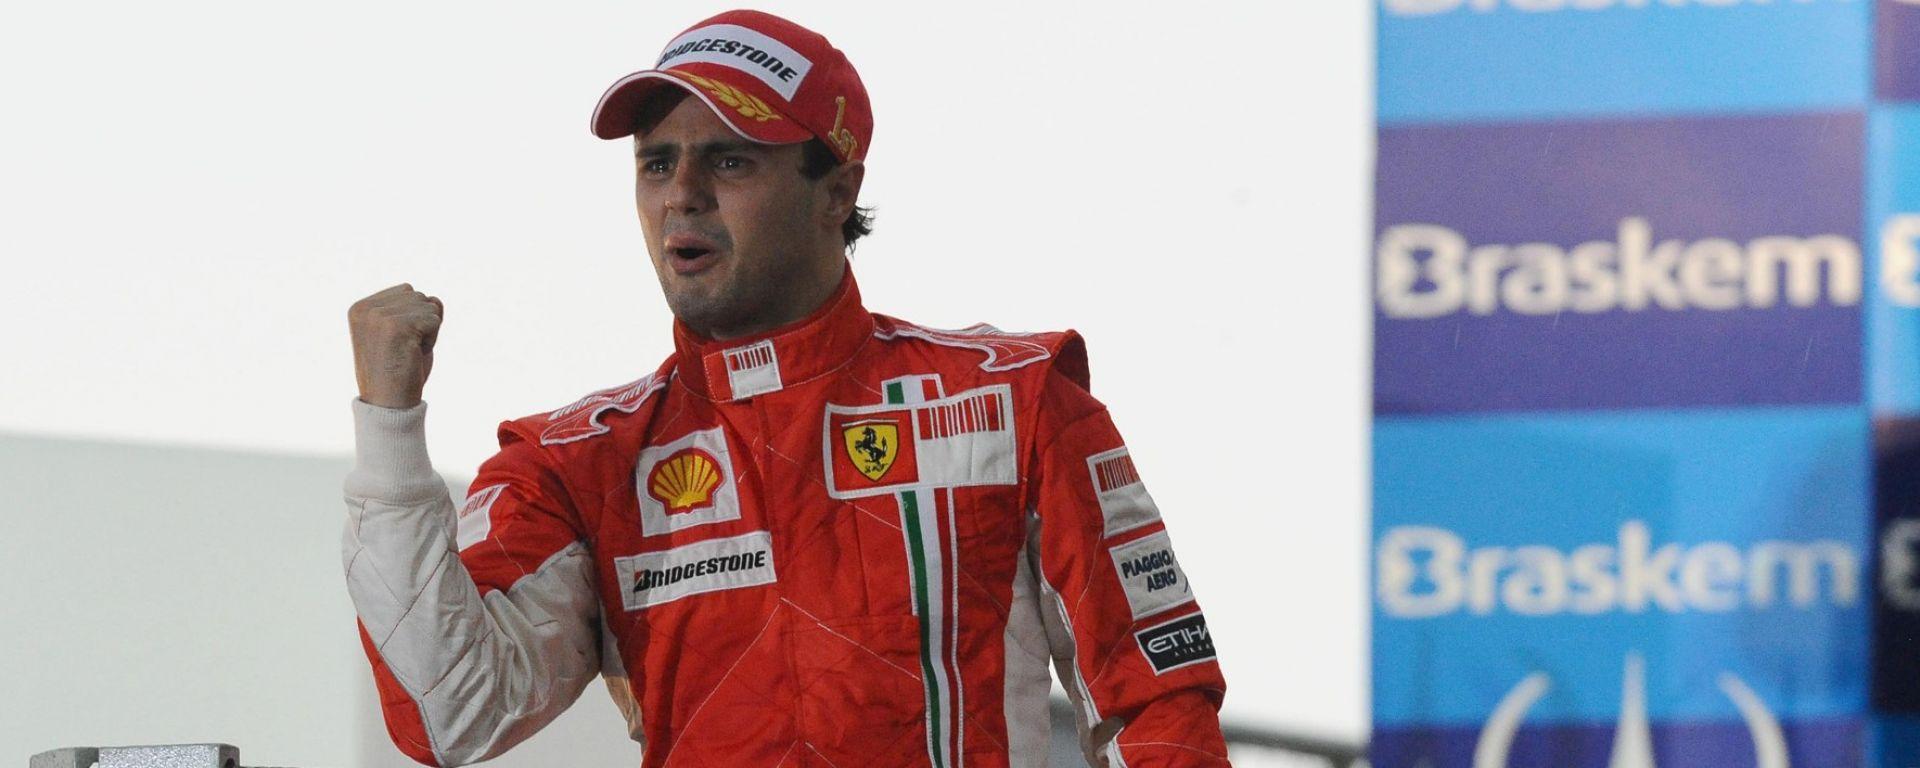 Felipe Massa - Interlagos 2008